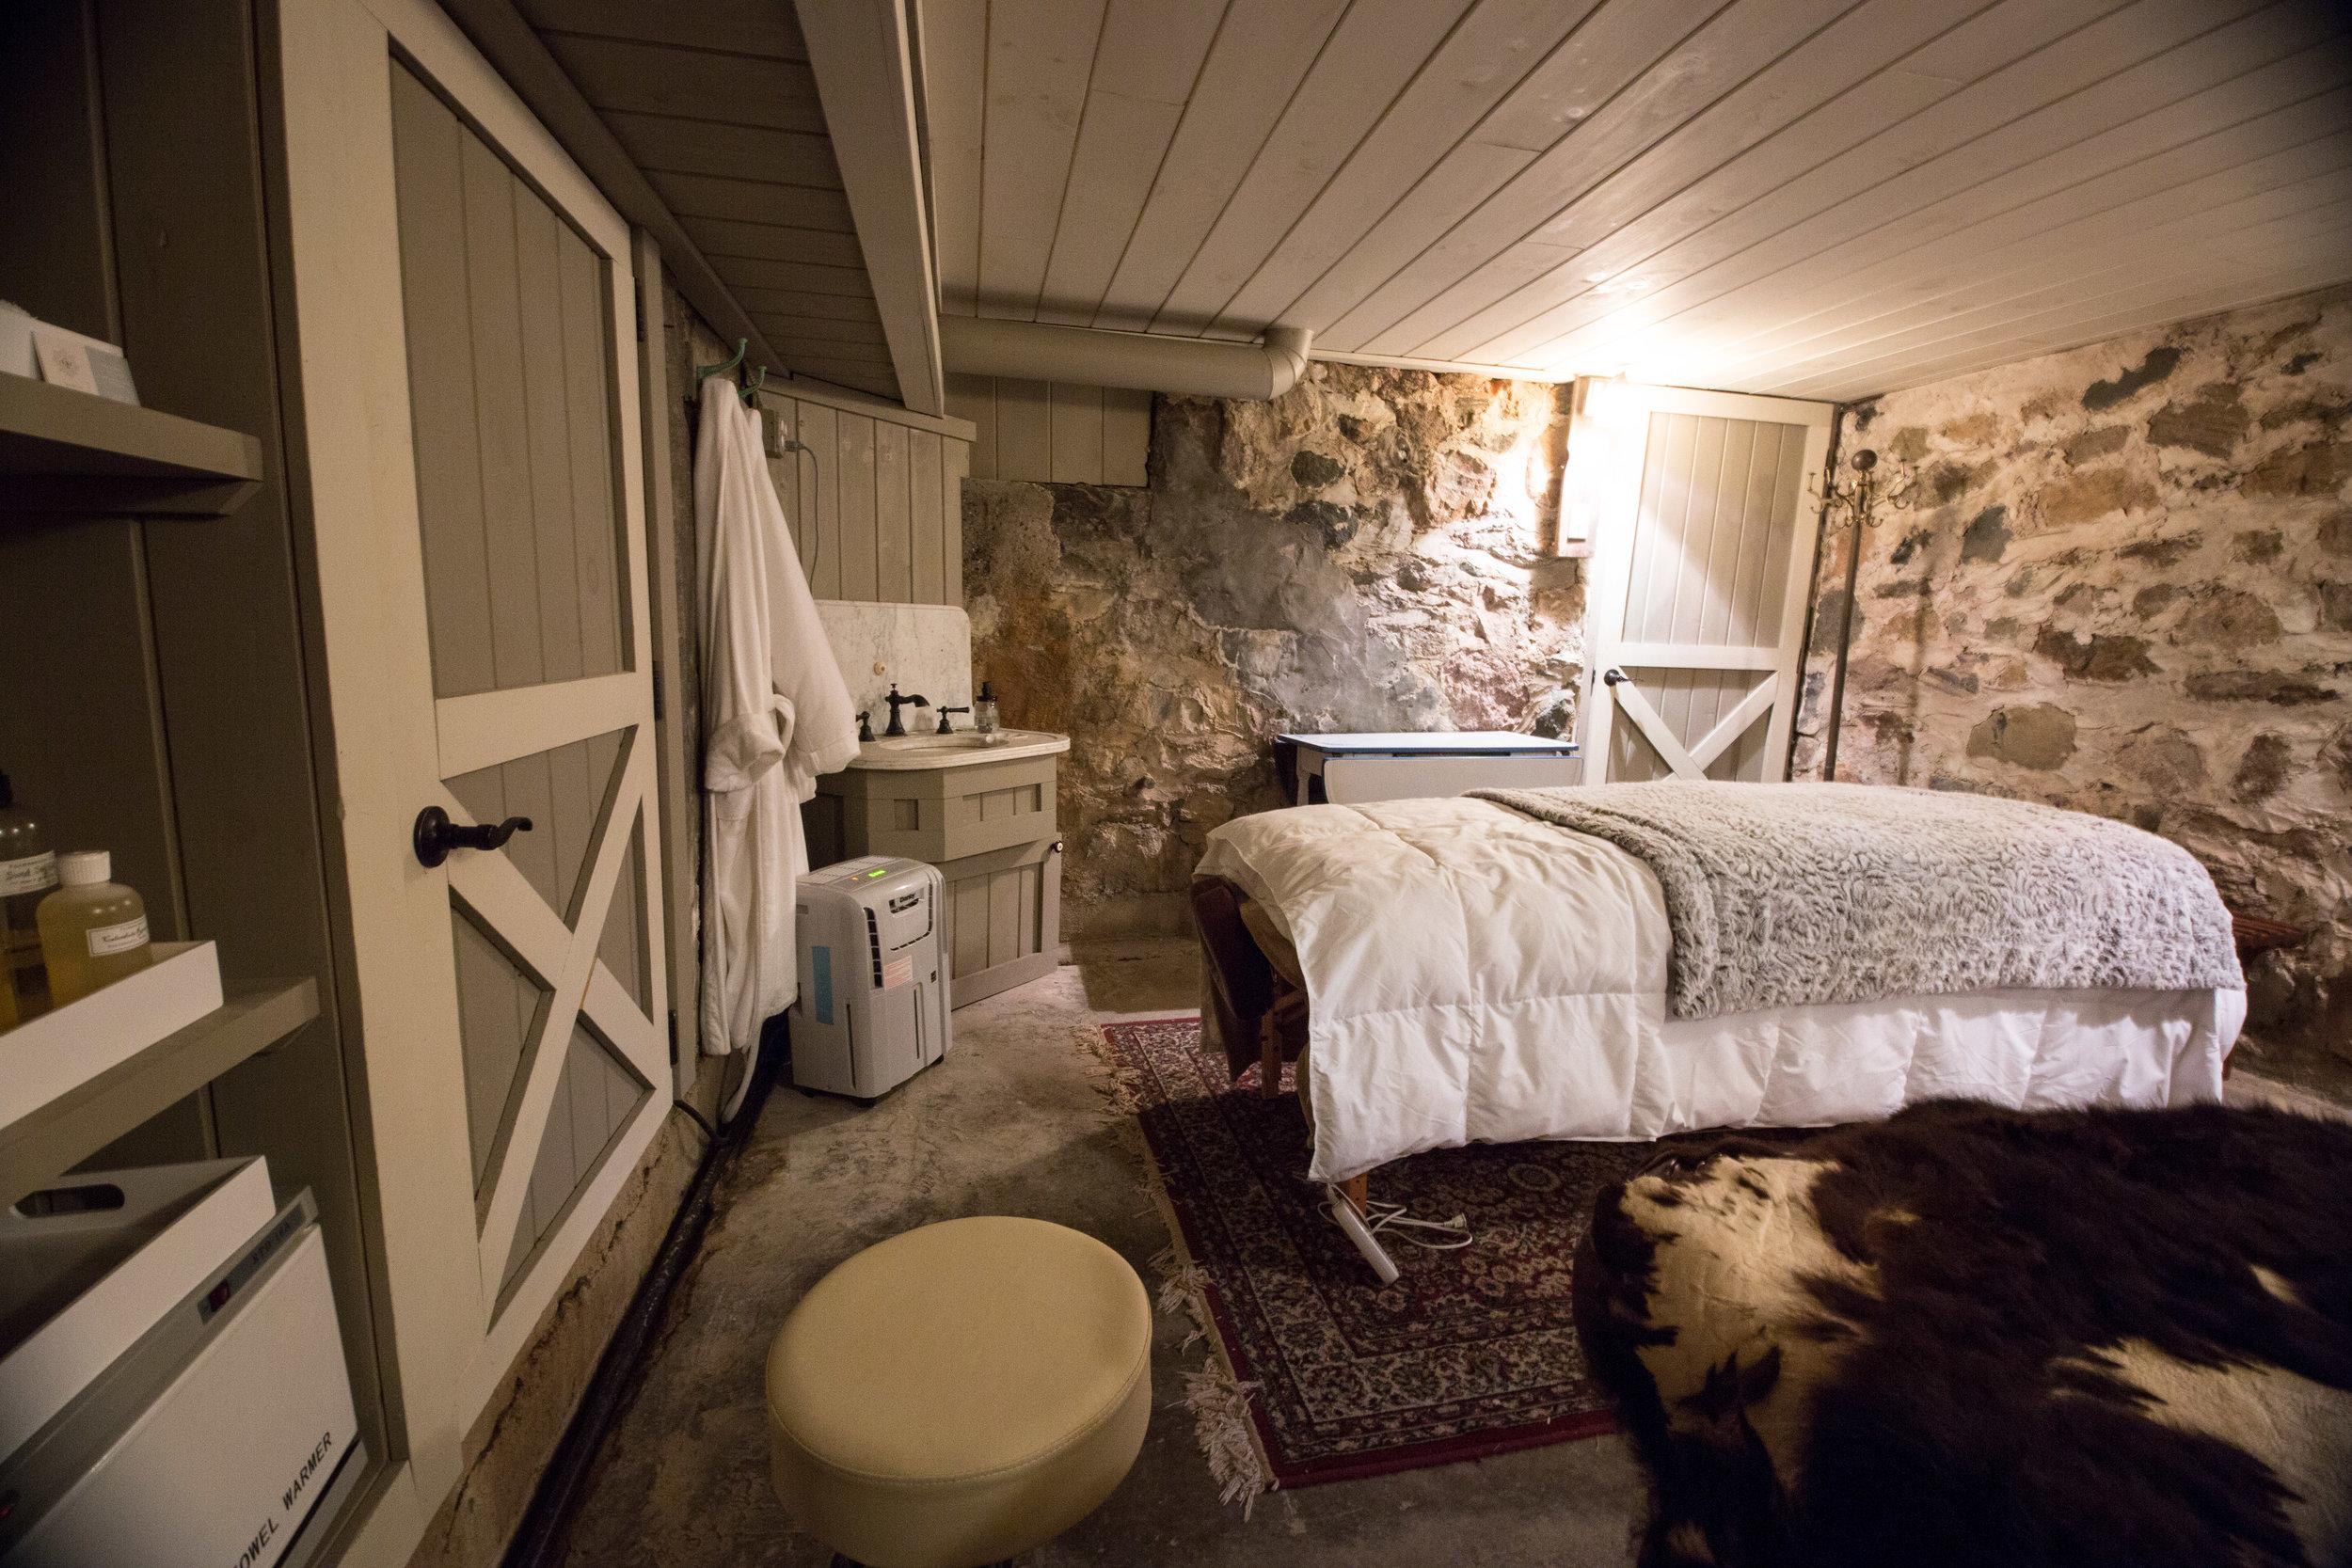 The Farmstead Spa Room - 60 minutes: $8090 minutes: $110120 minutes: $180Contact Marissa: 260.715.2547peaceofmindroanoke@gmail.com